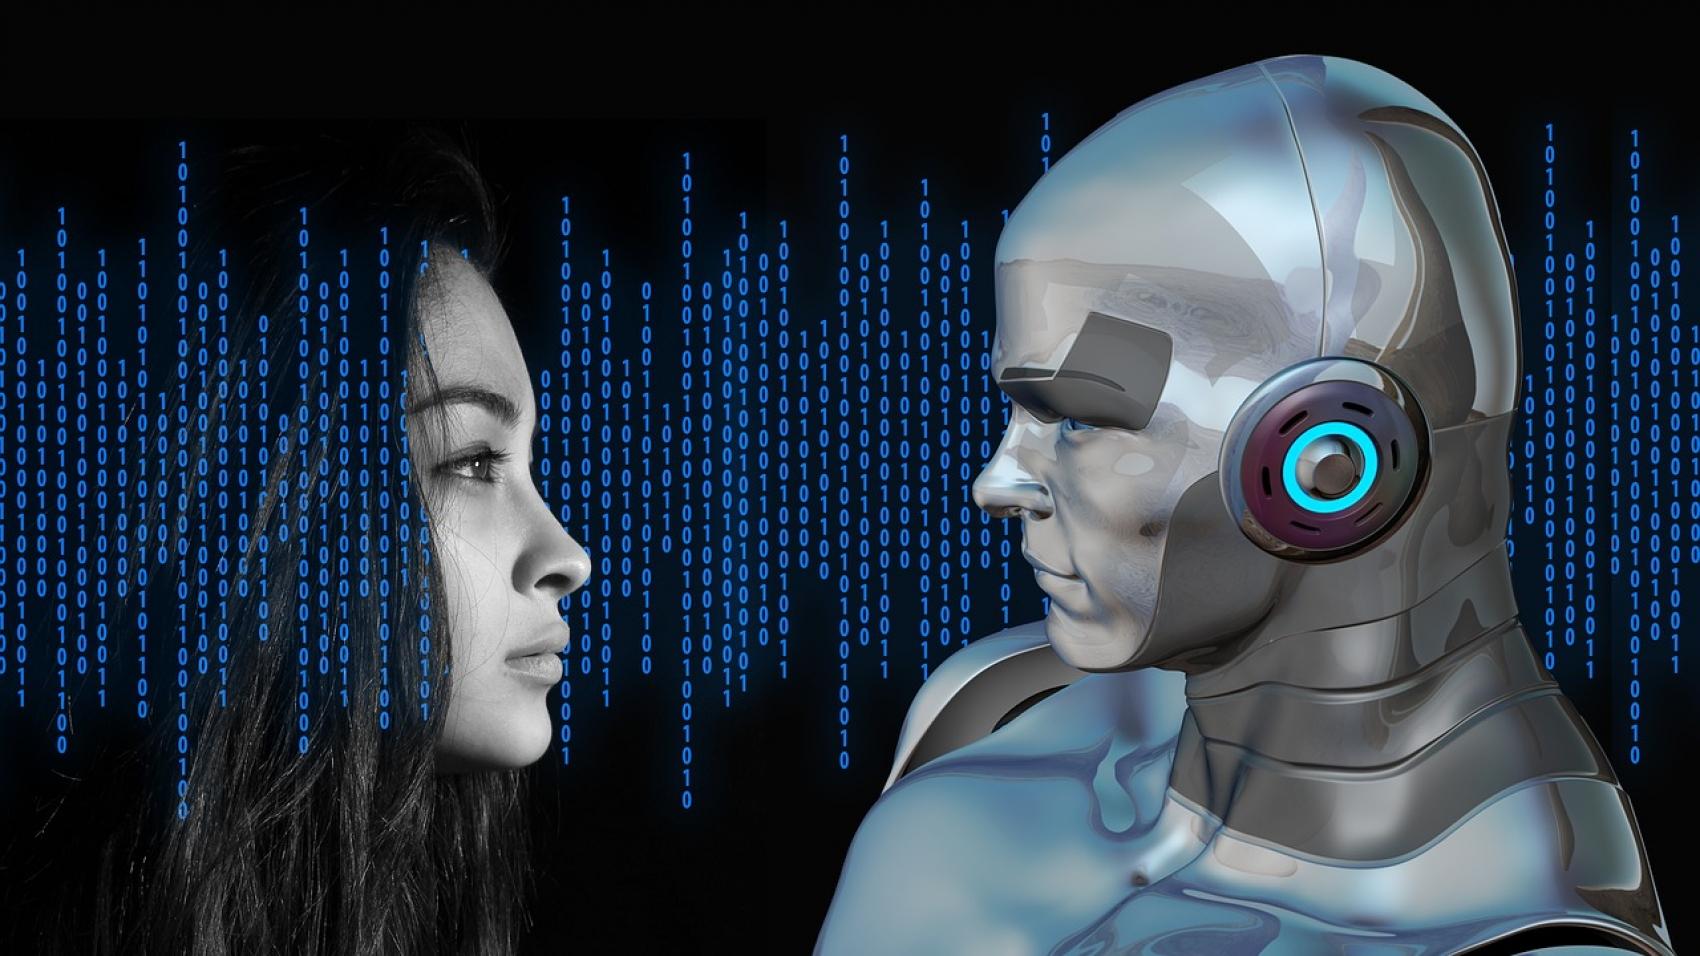 AI systems vs human